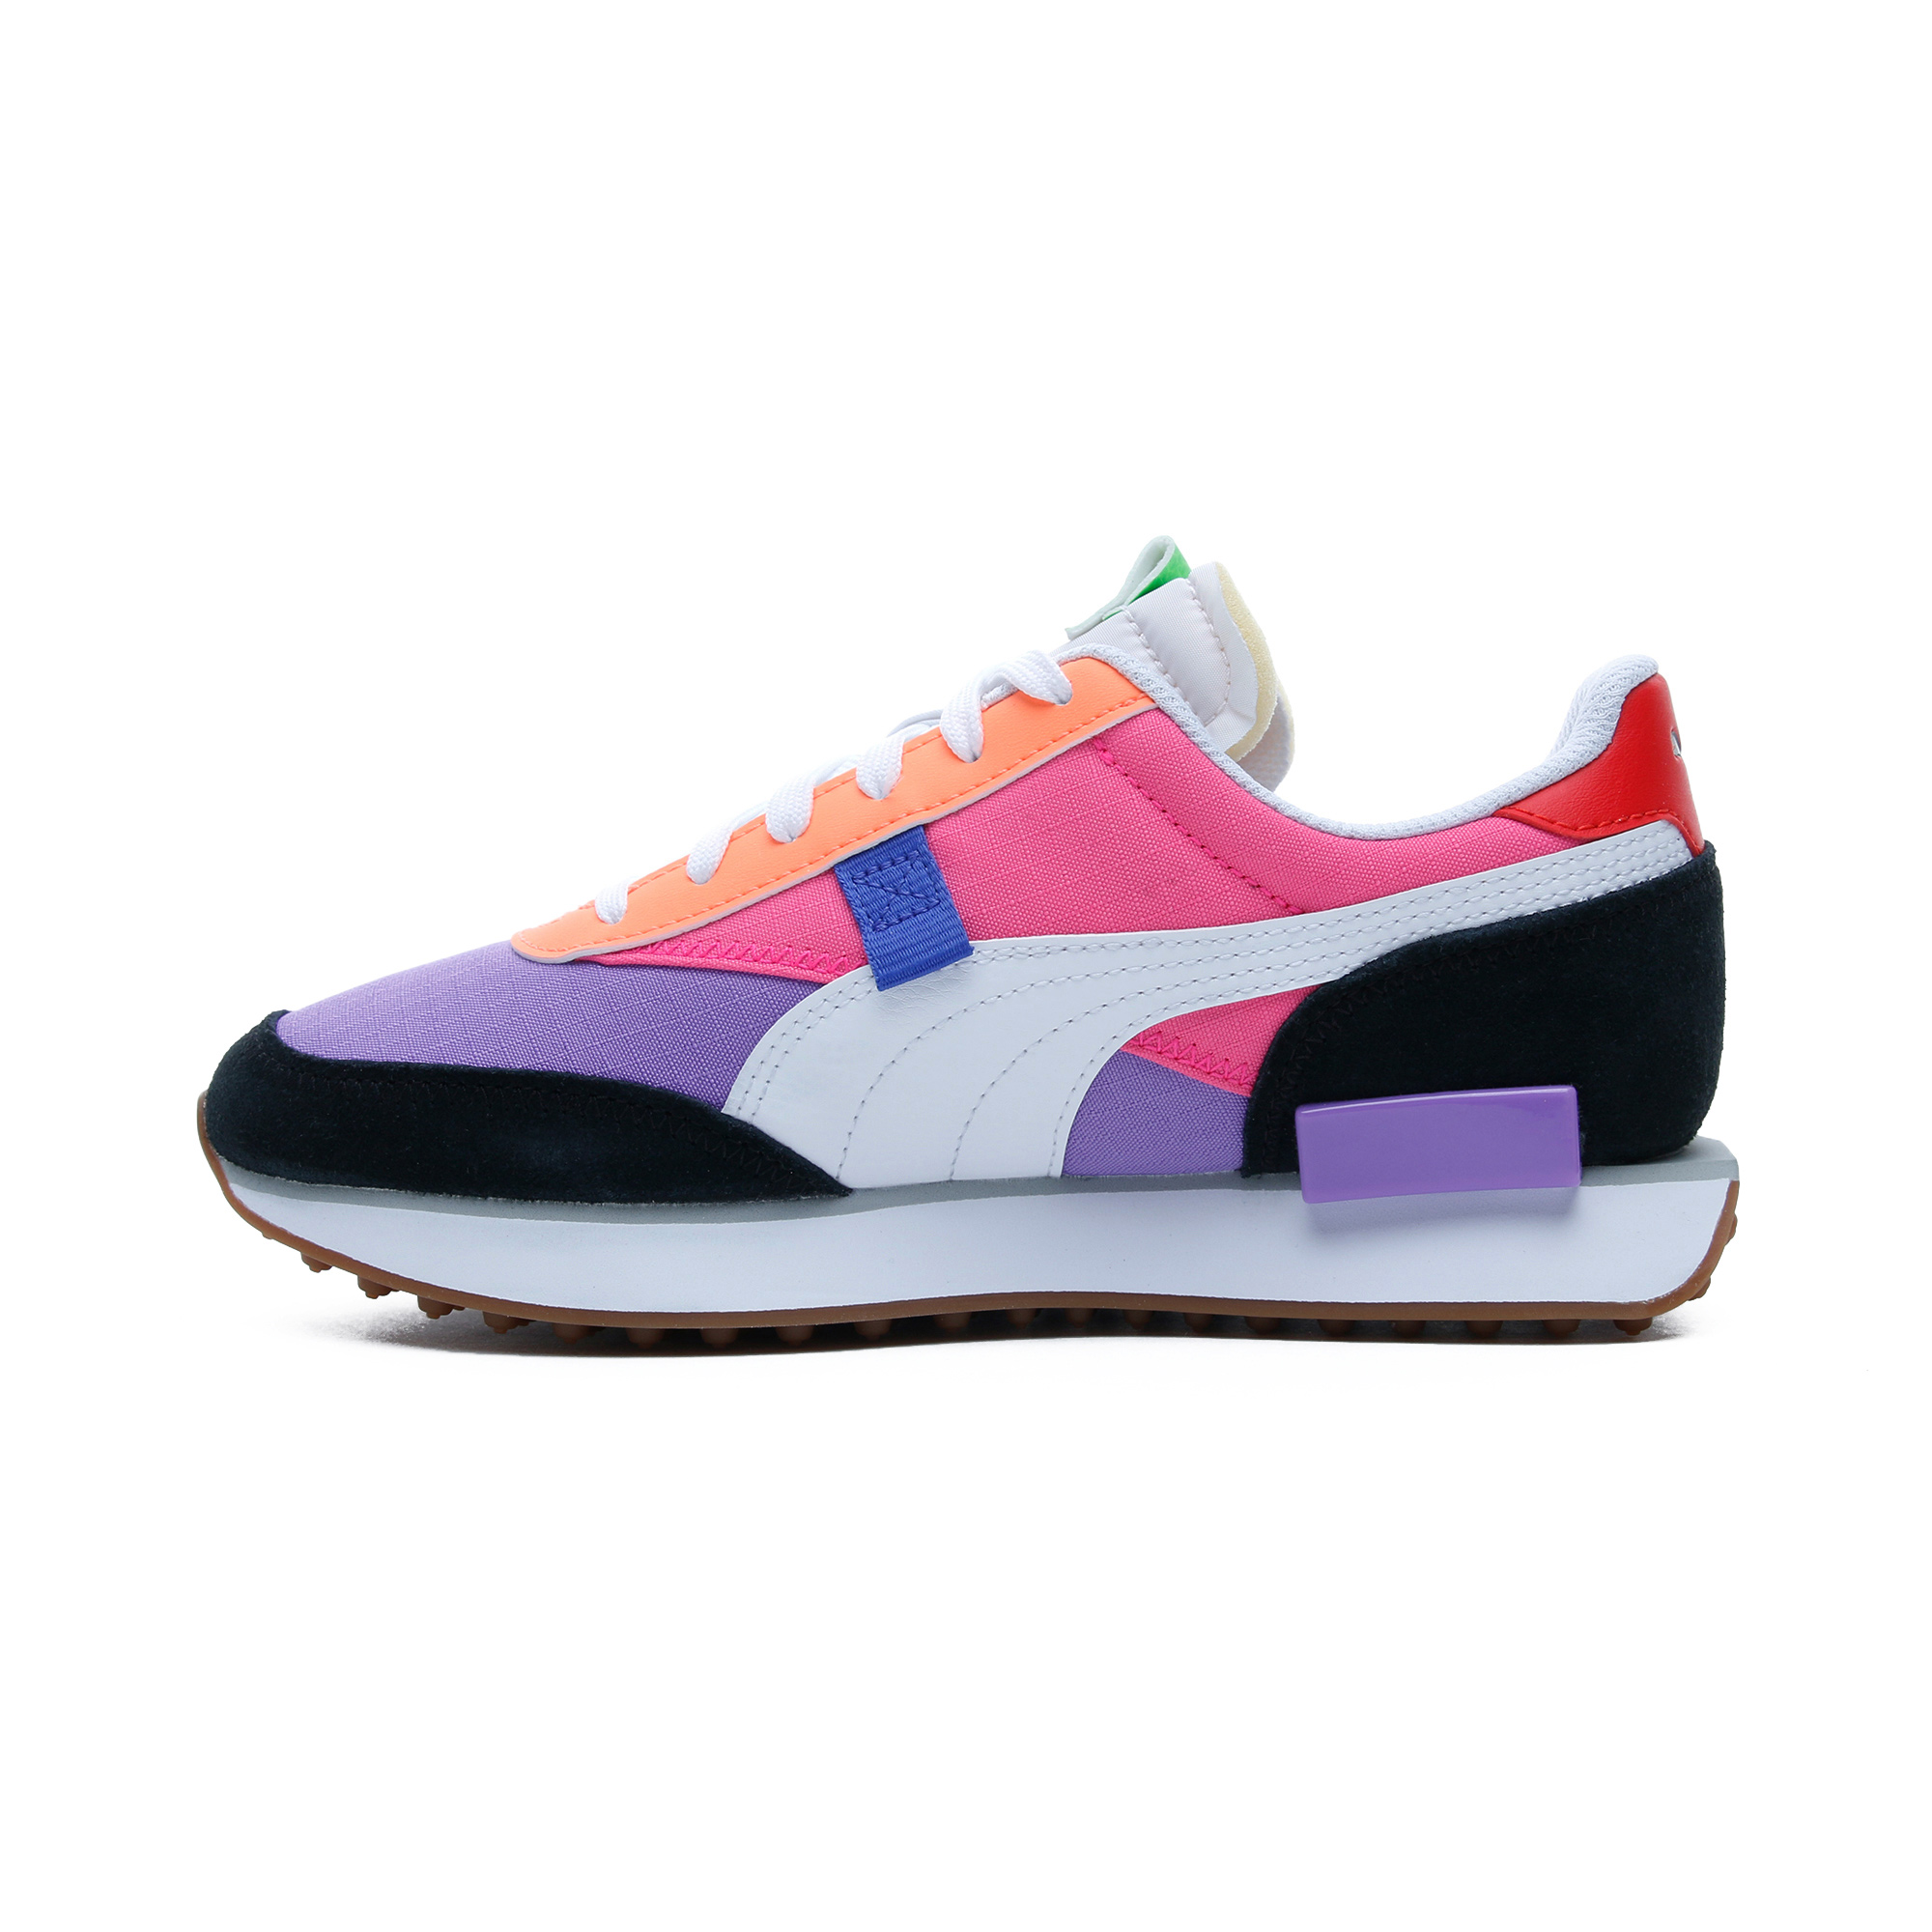 Puma Rider Game On Kadın Renkli Spor Ayakkabı